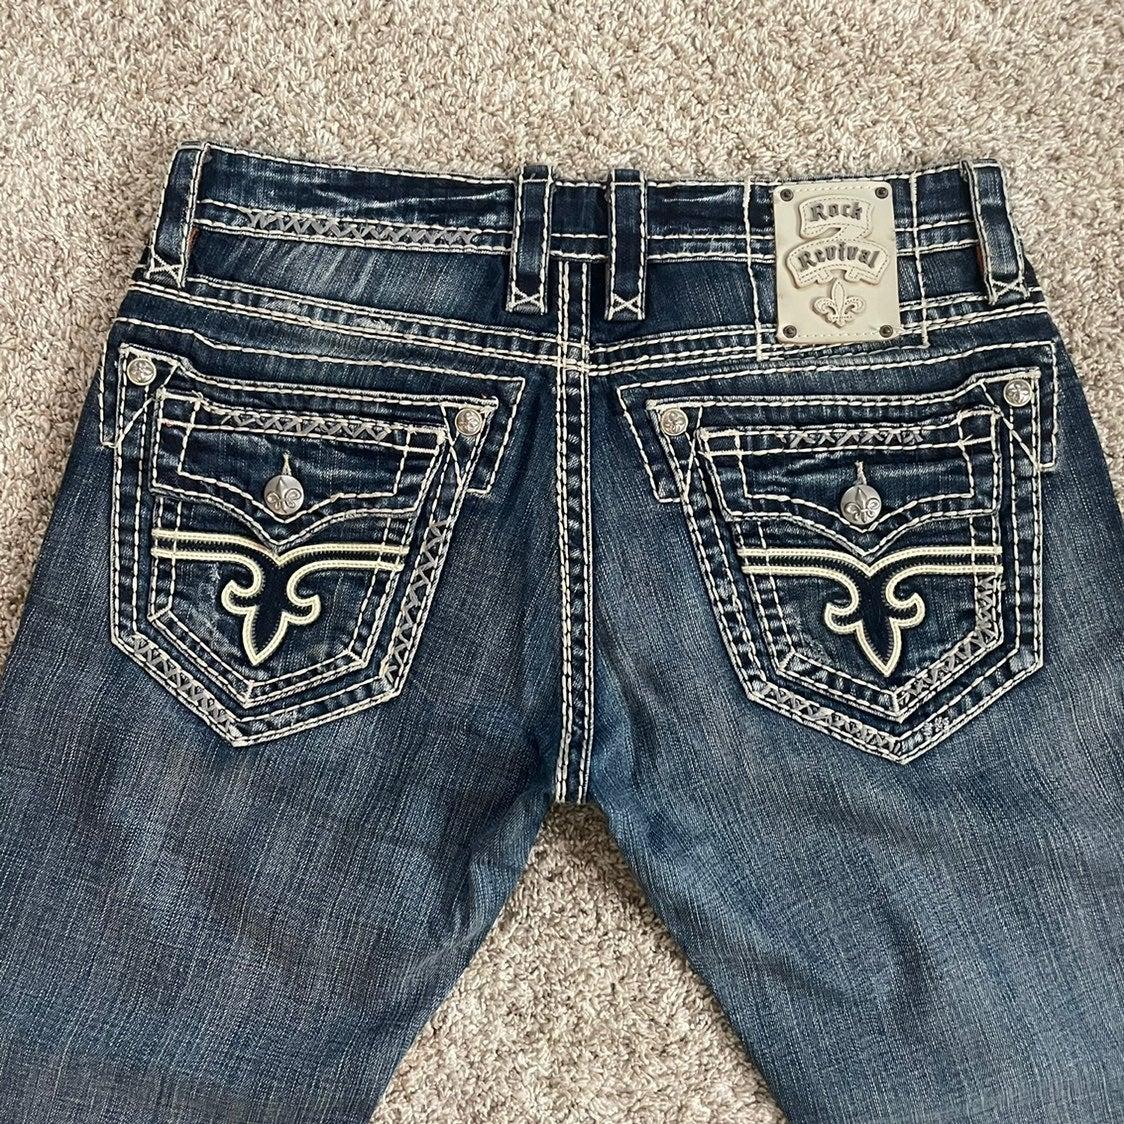 Mens Rock Revival Jeans sz 34!